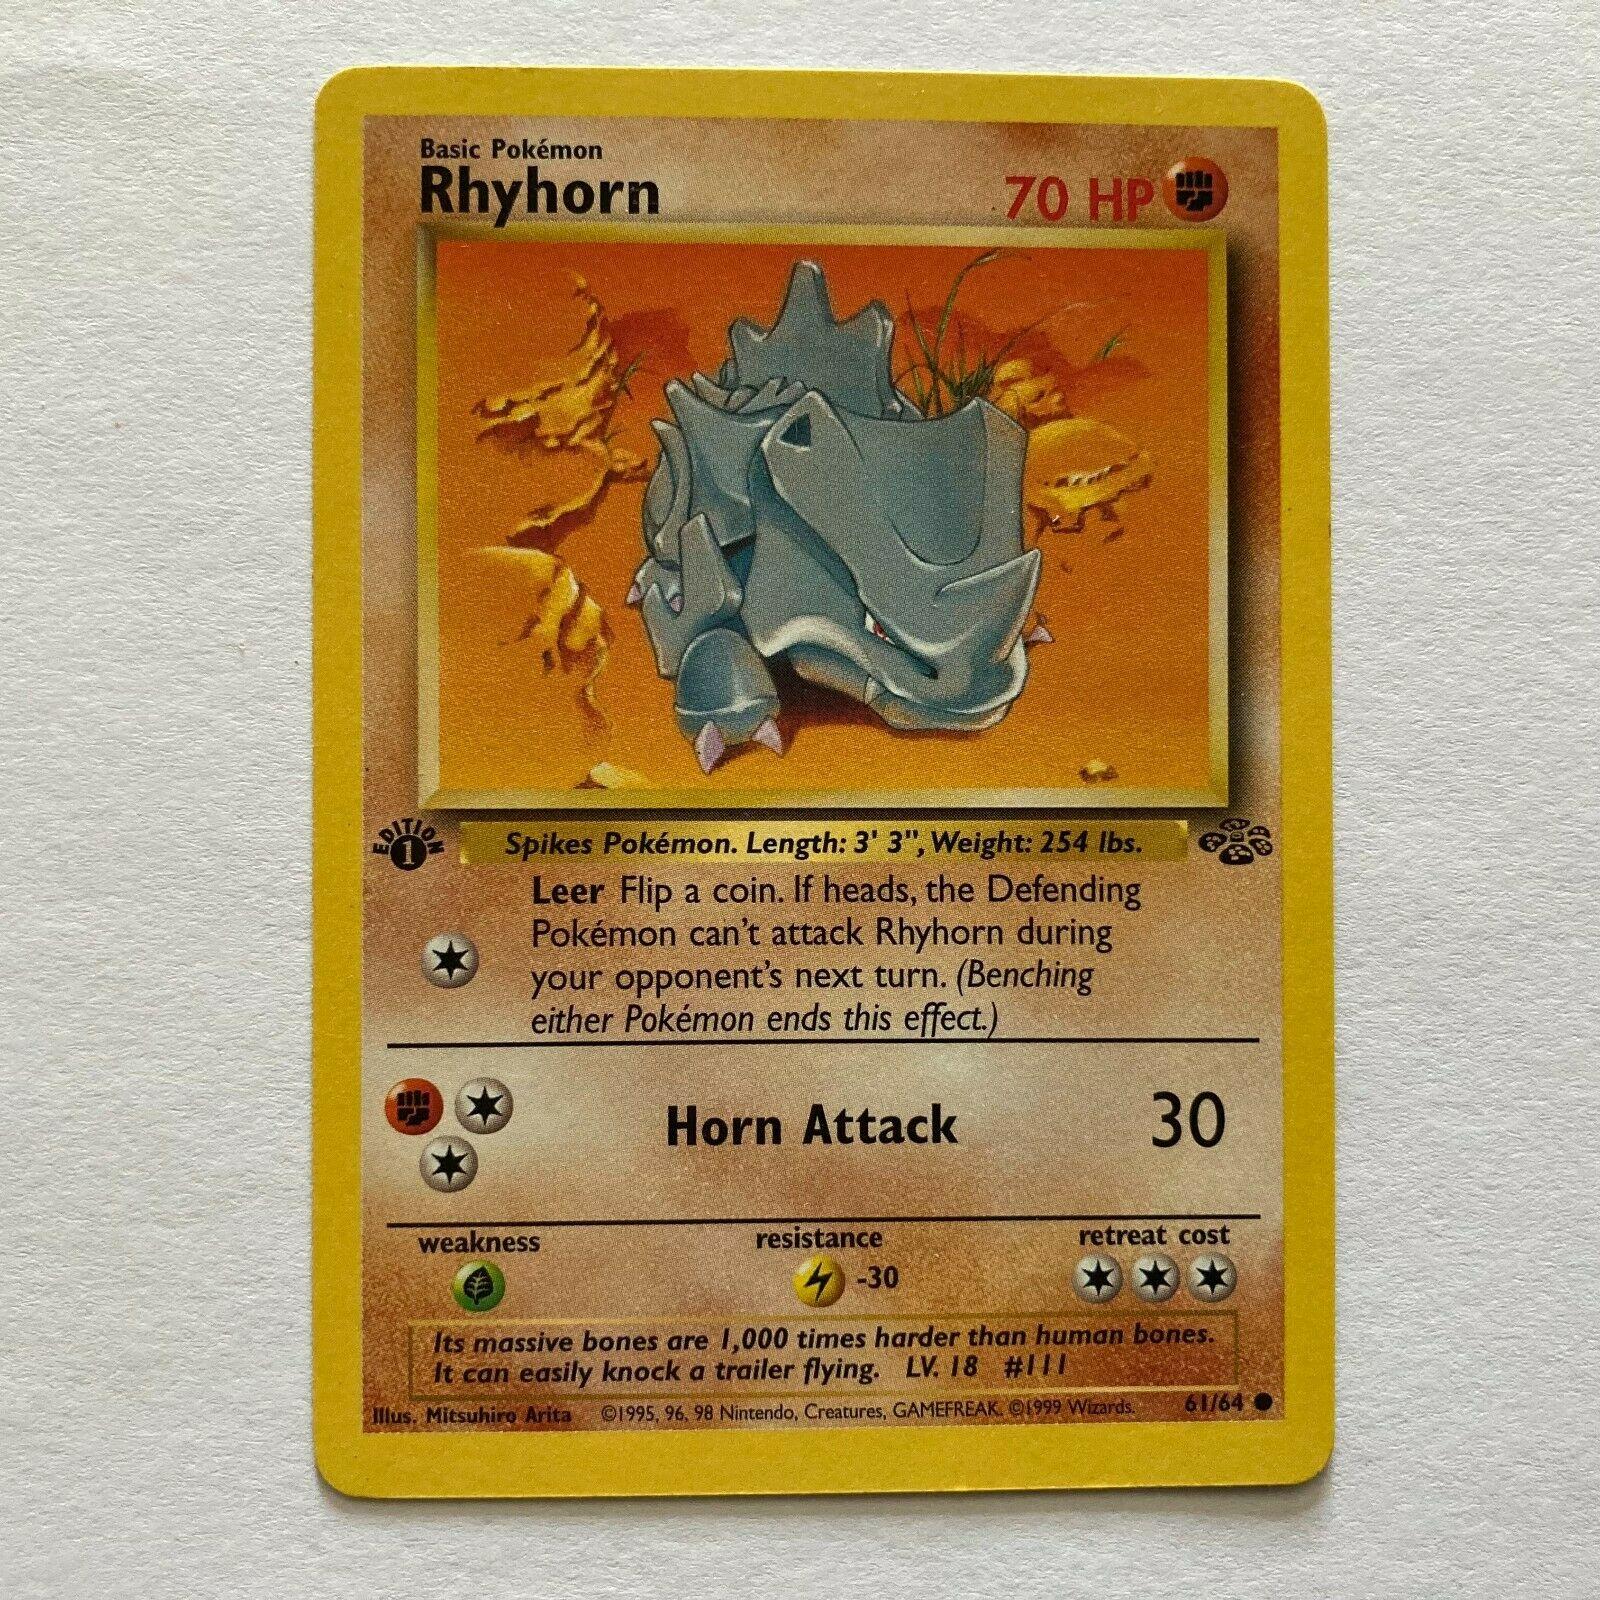 Rhyhorn Jungle 61 64 Value 0 50 120 00 Mavin